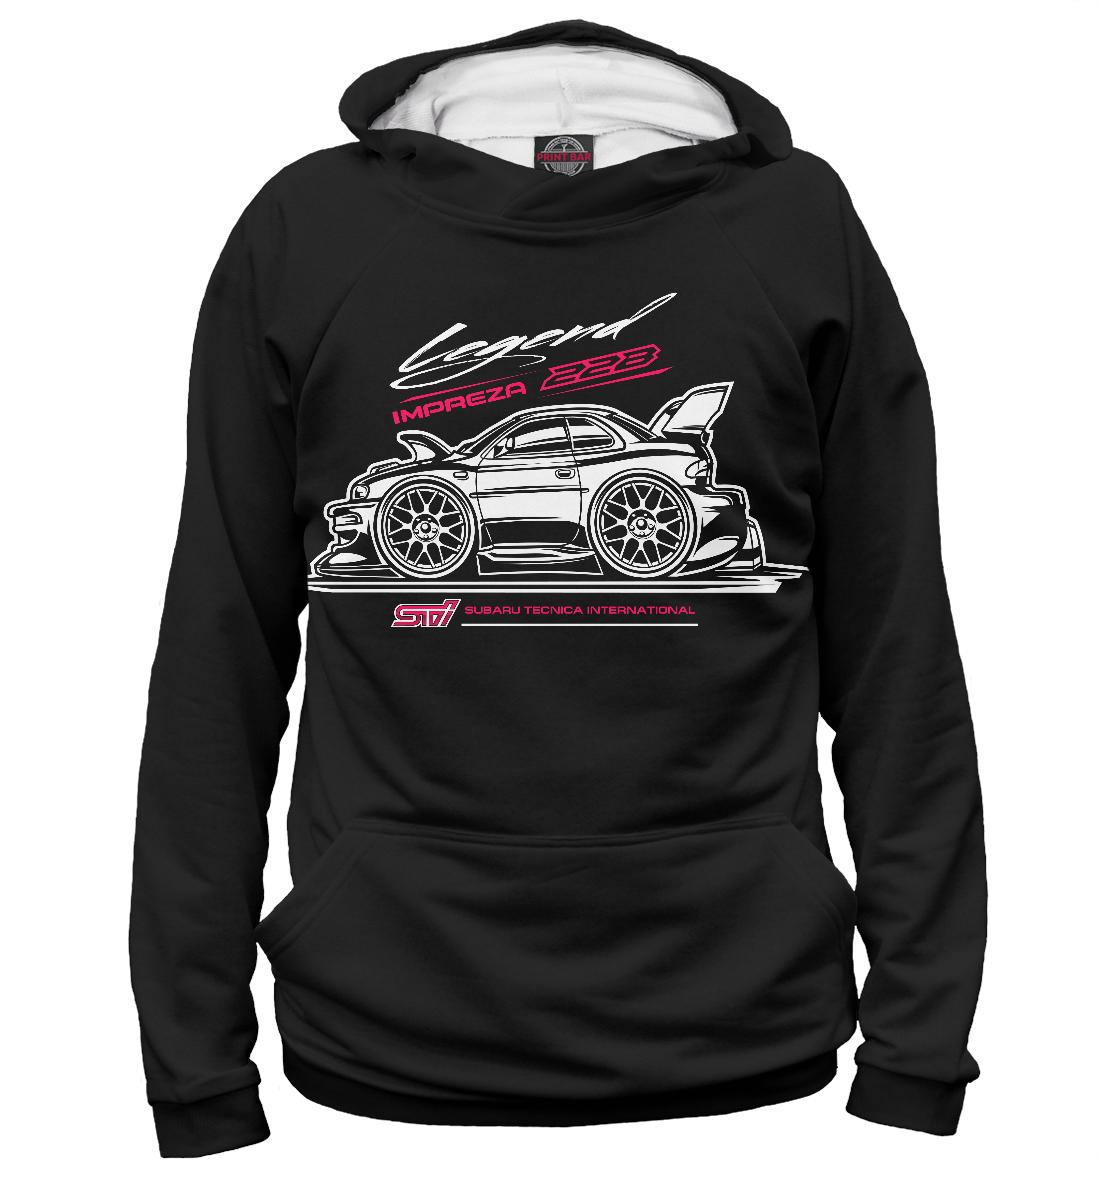 Купить Subaru 22b 2, Printbar, Худи, SBR-775690-hud-1